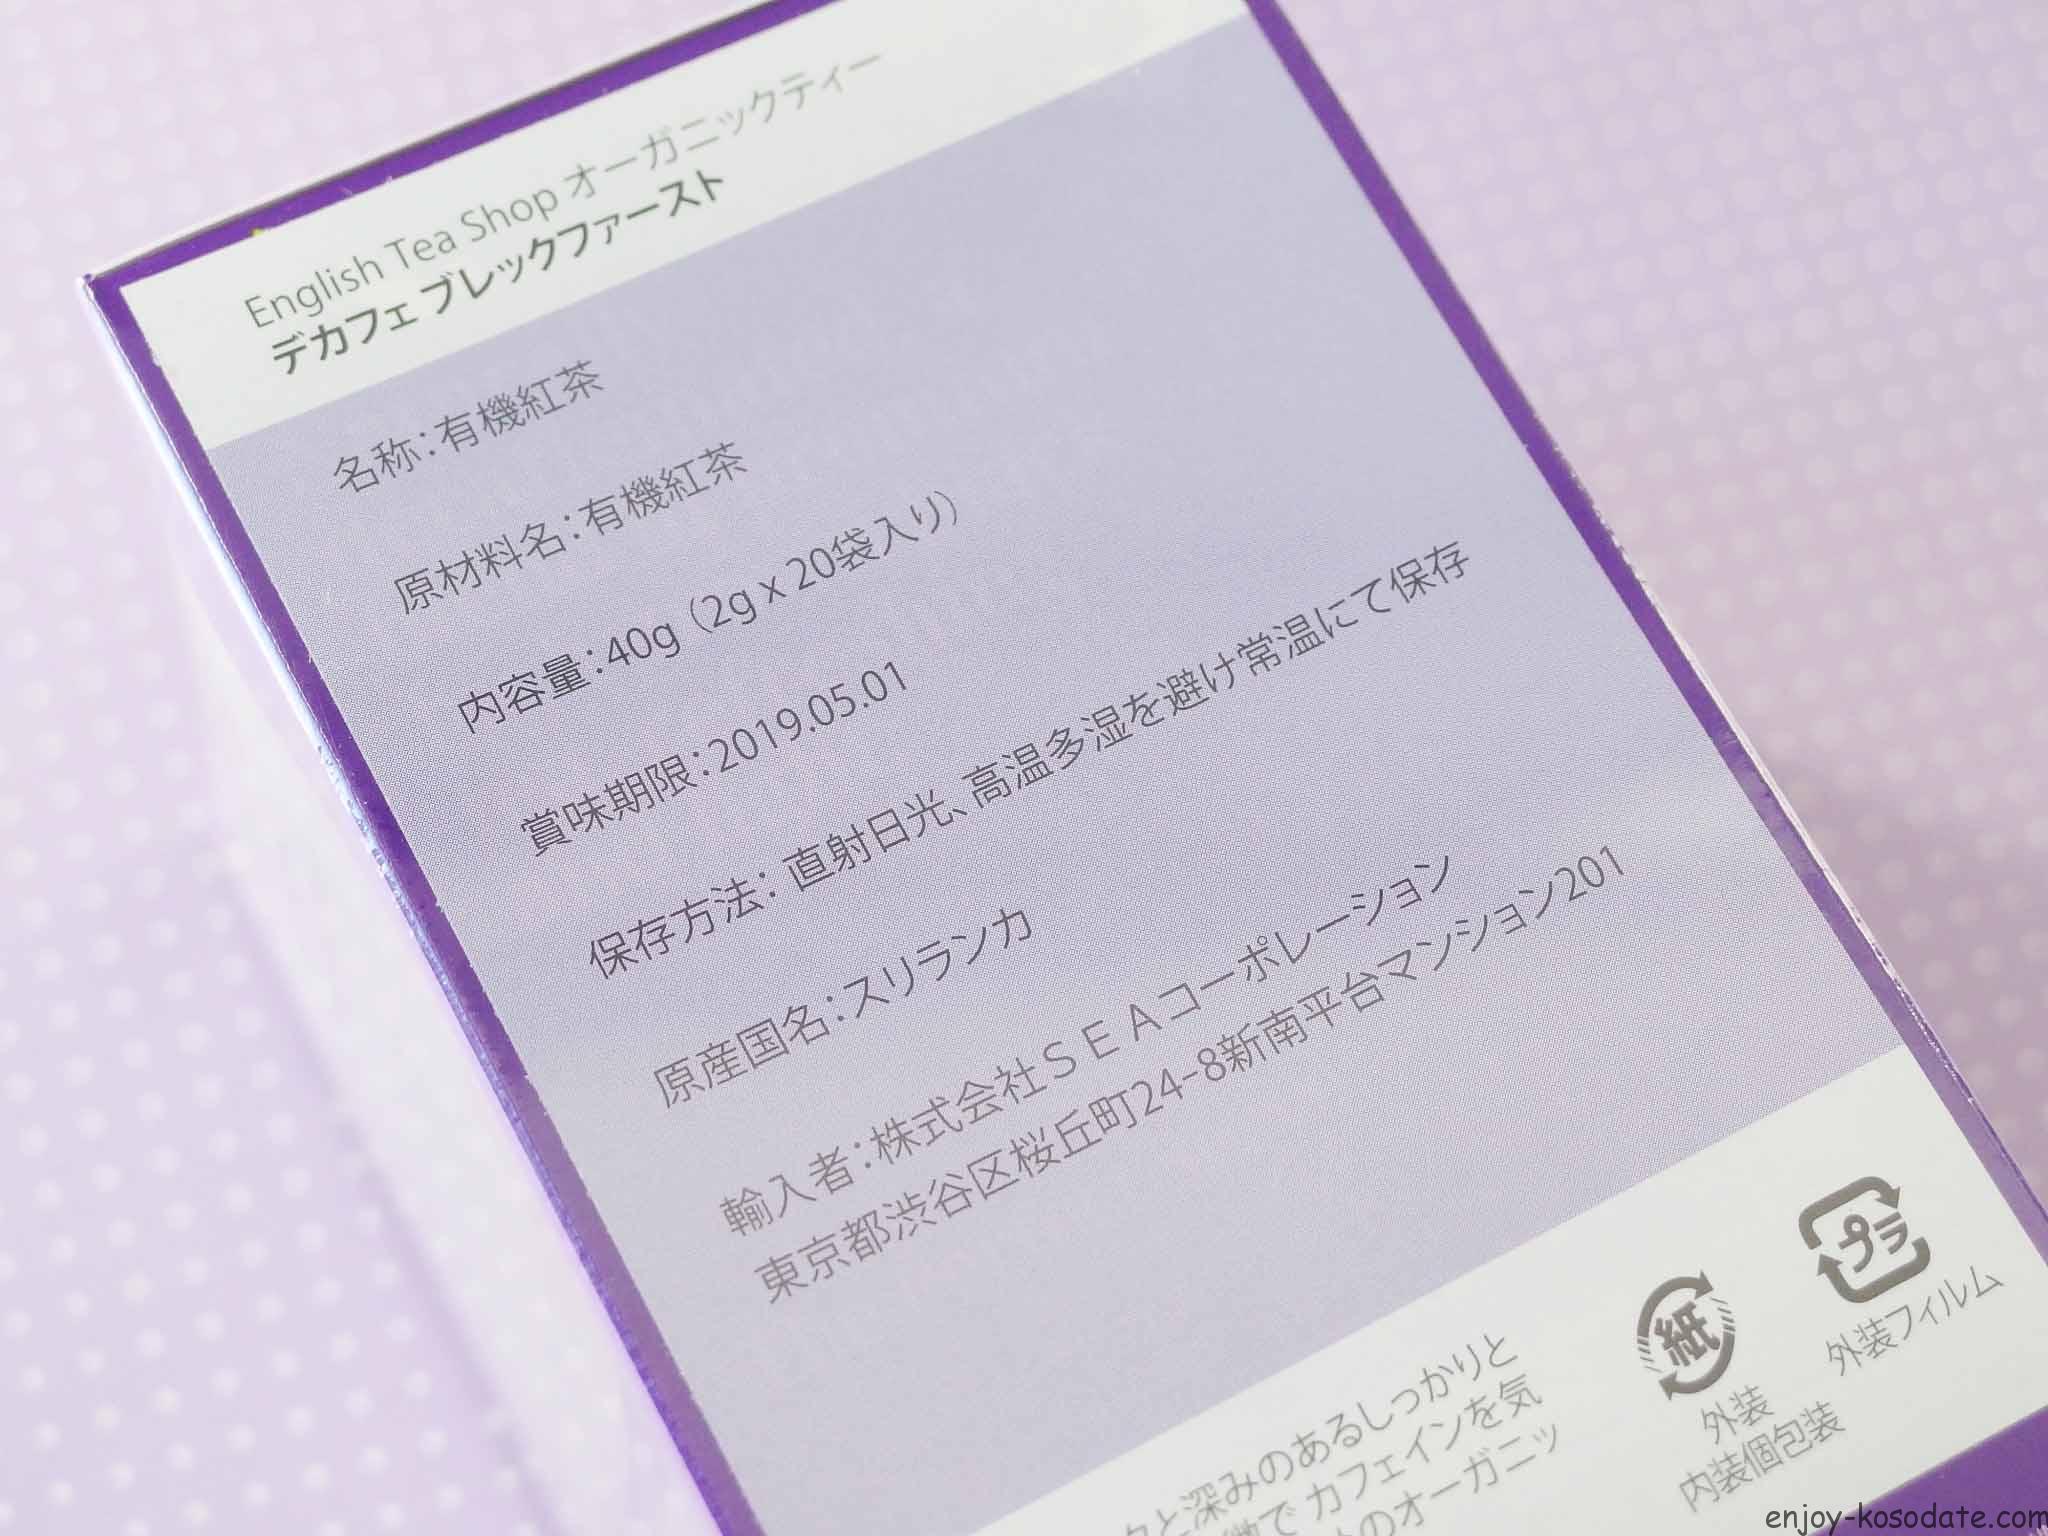 IMGP4102 - コピー